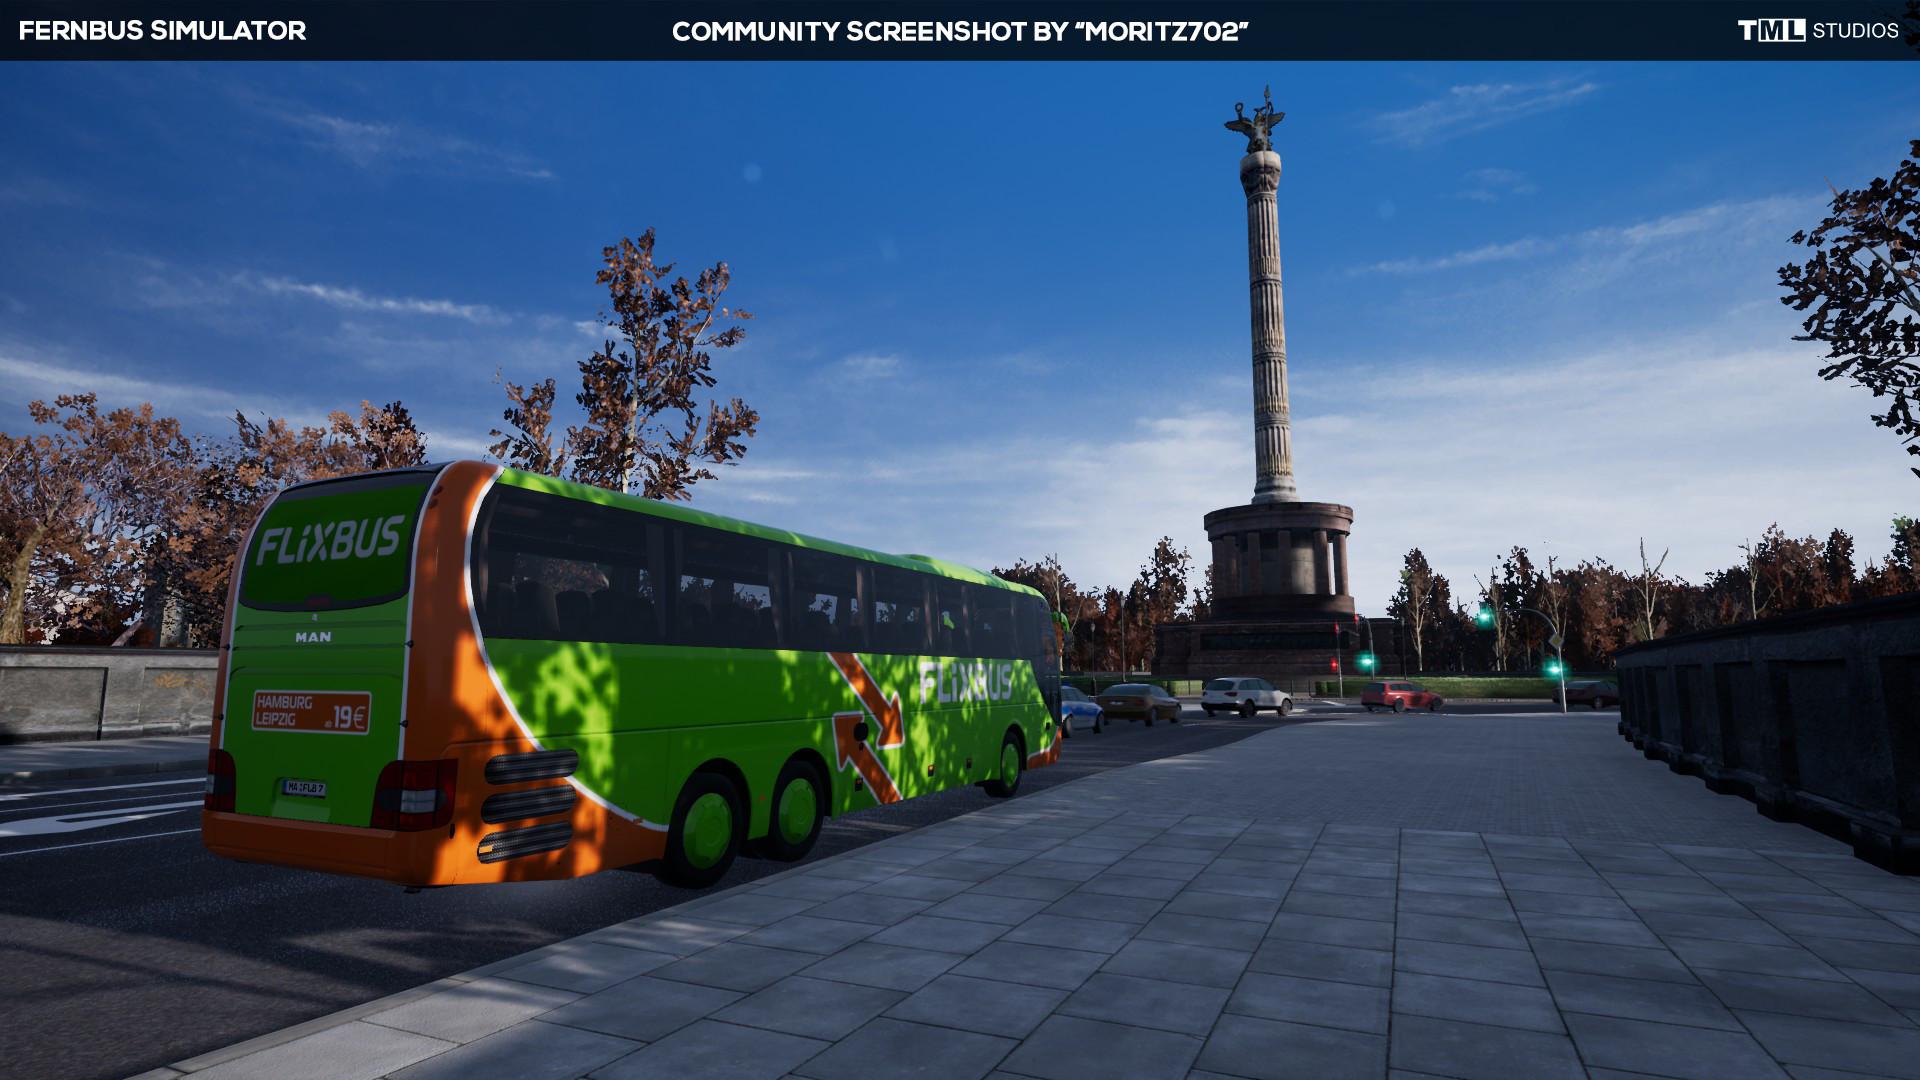 Fernbus simulator ключ